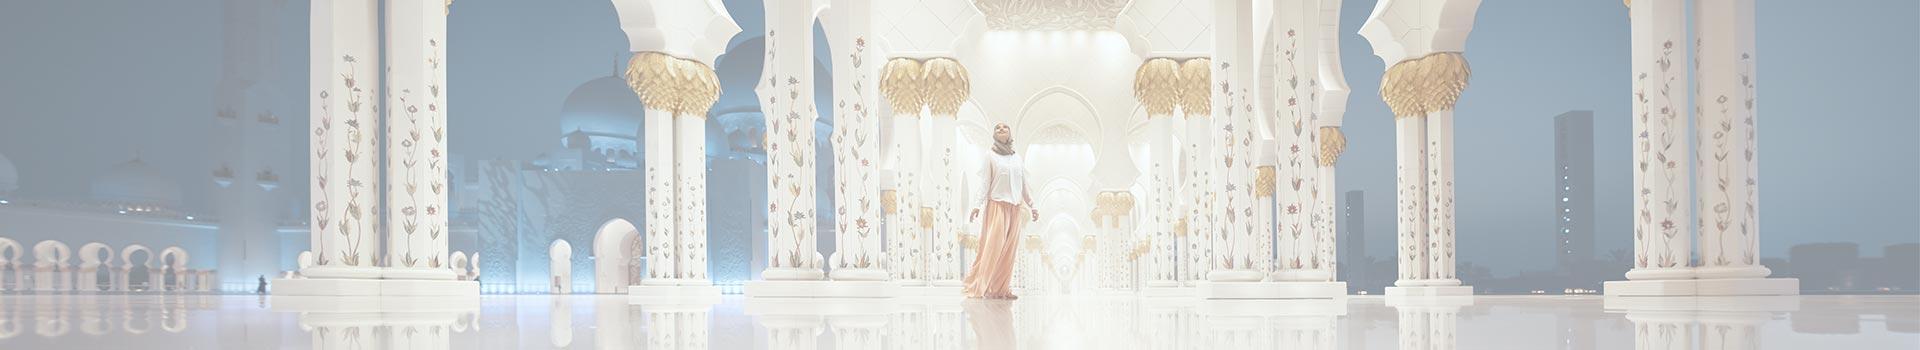 Luxus- & Individualreisen Abu Dhabi